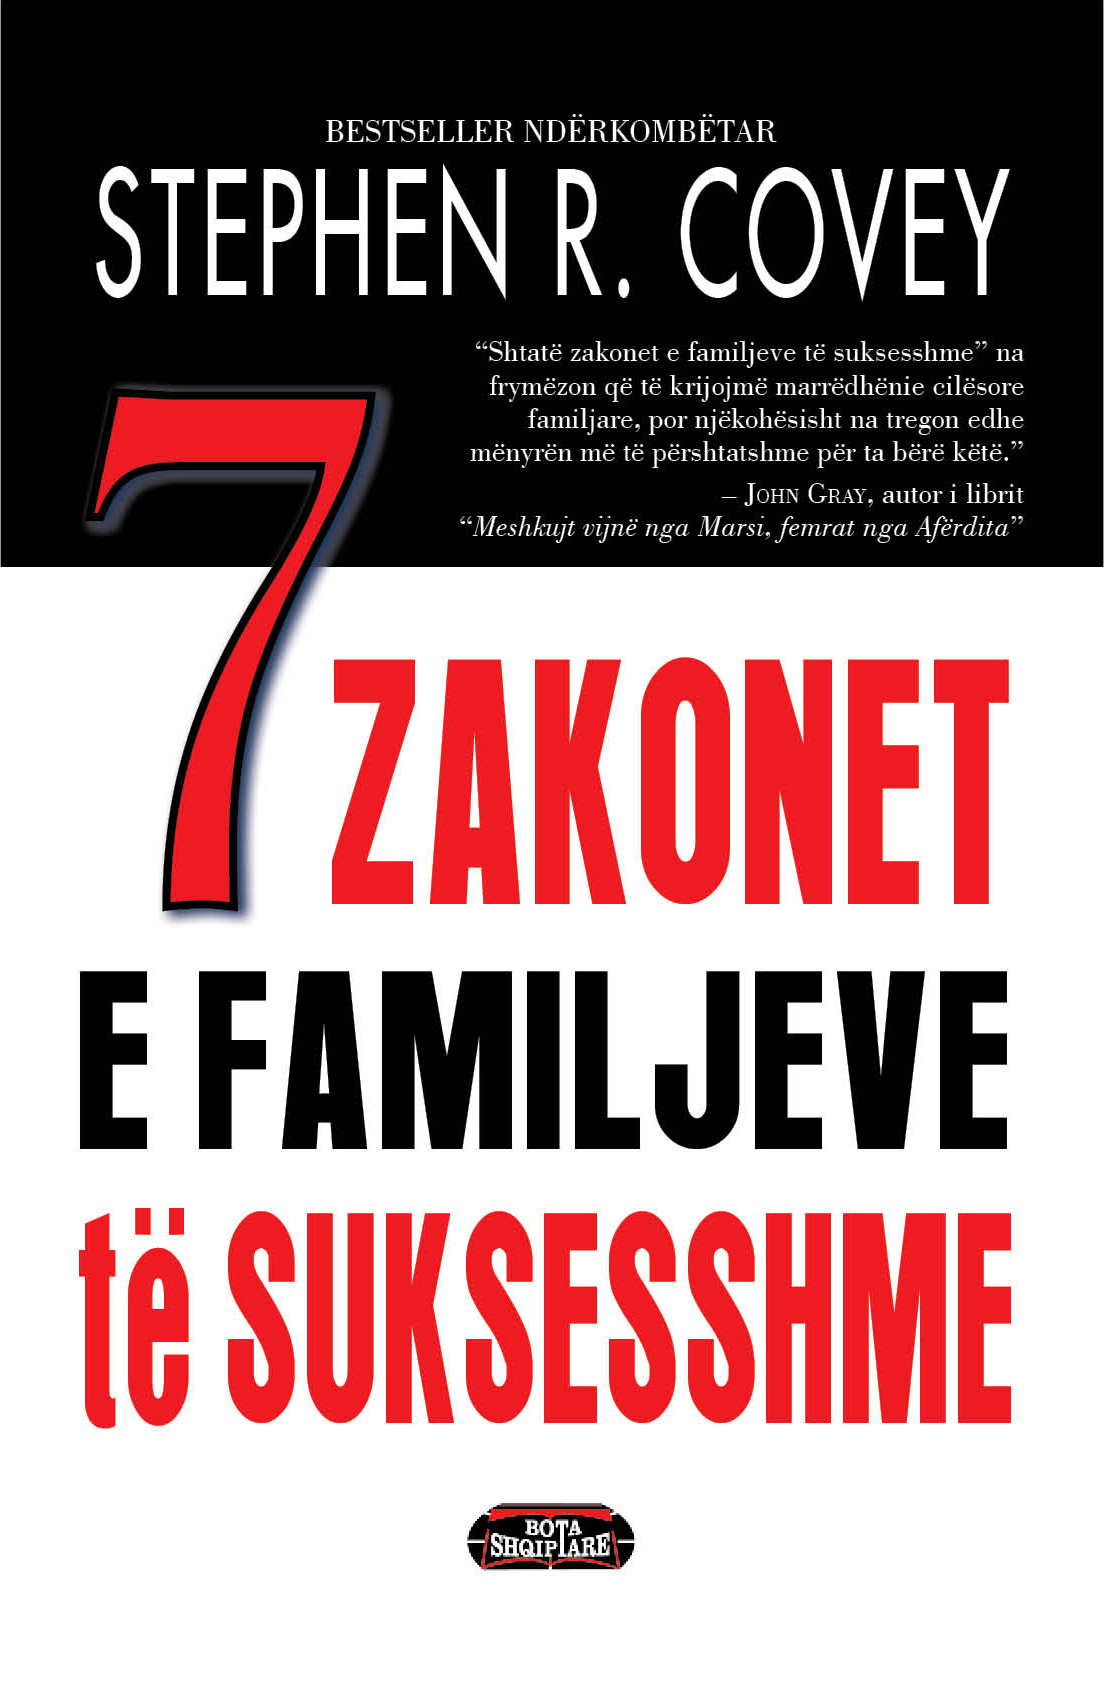 Shtate zakonet e familjeve te suksesshme